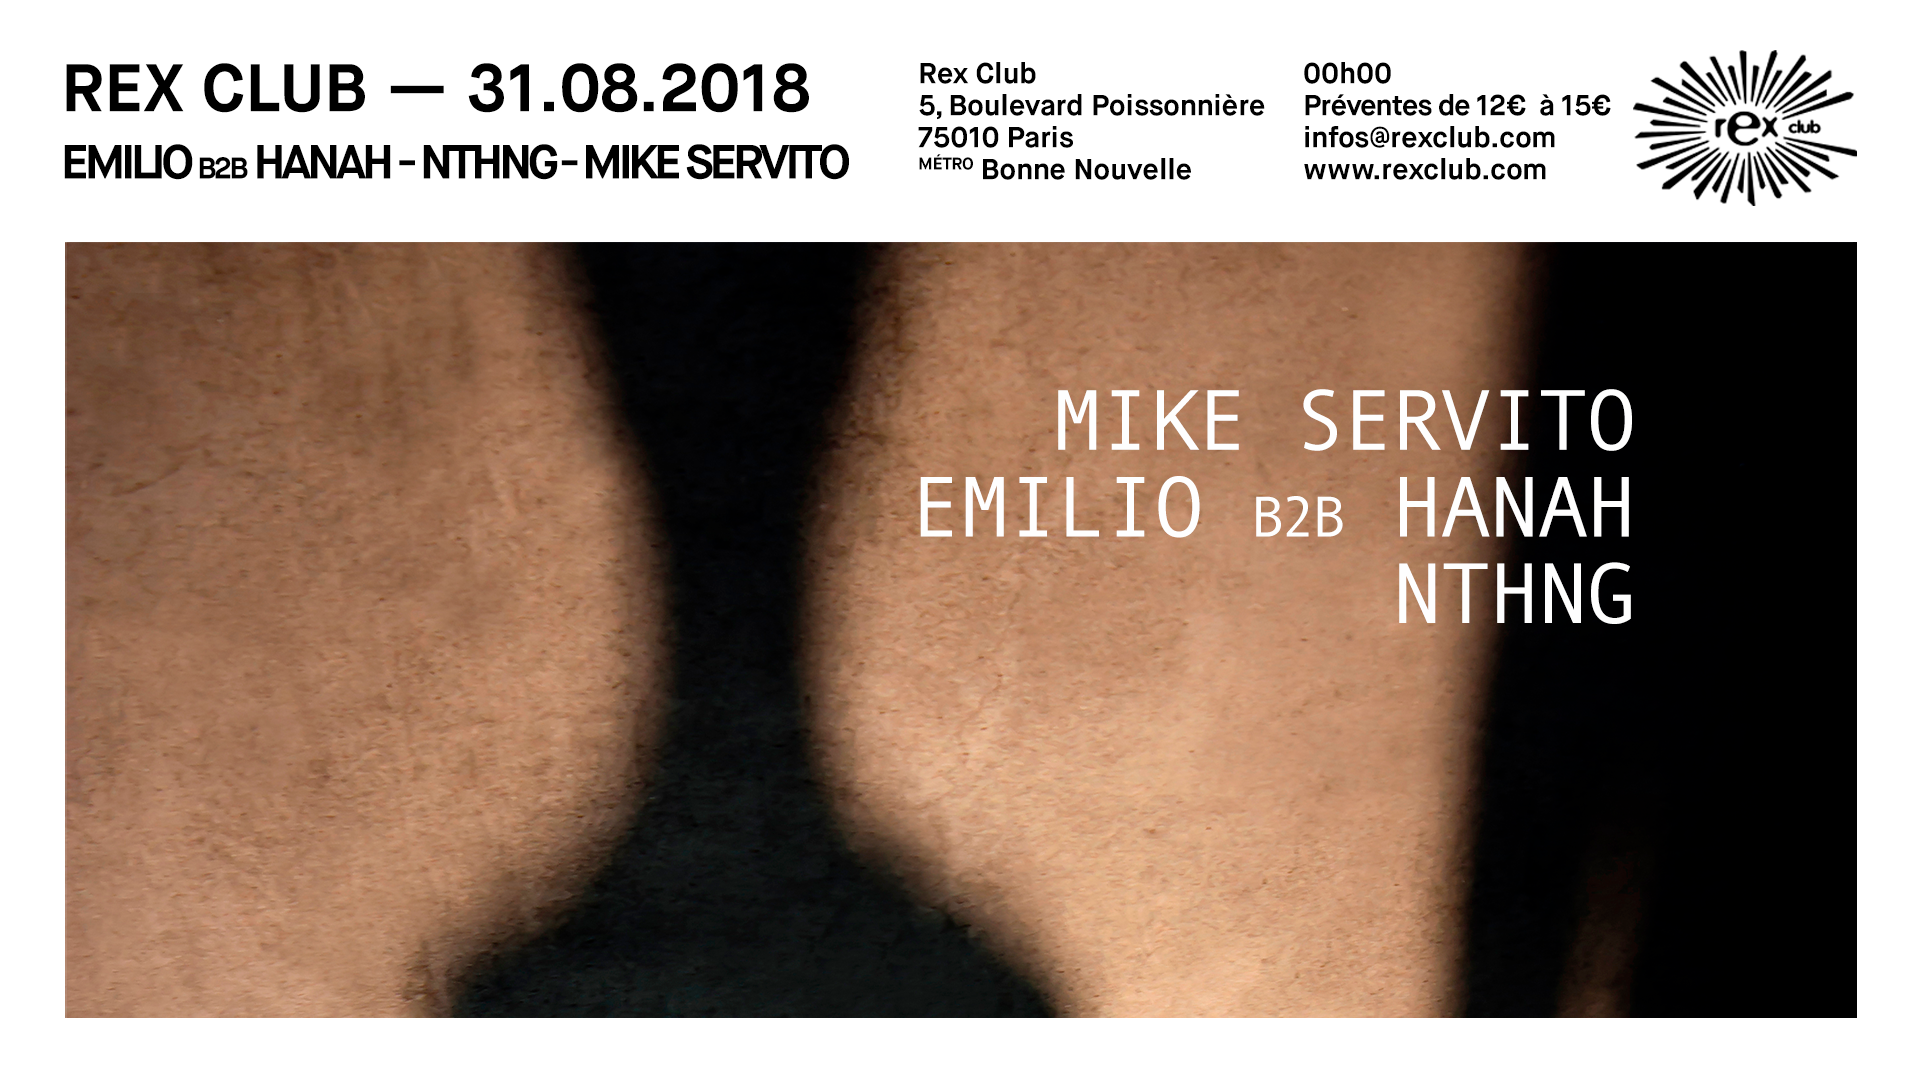 20180831_rex_club_mike_servito_facebook_event_banner_1920x1080